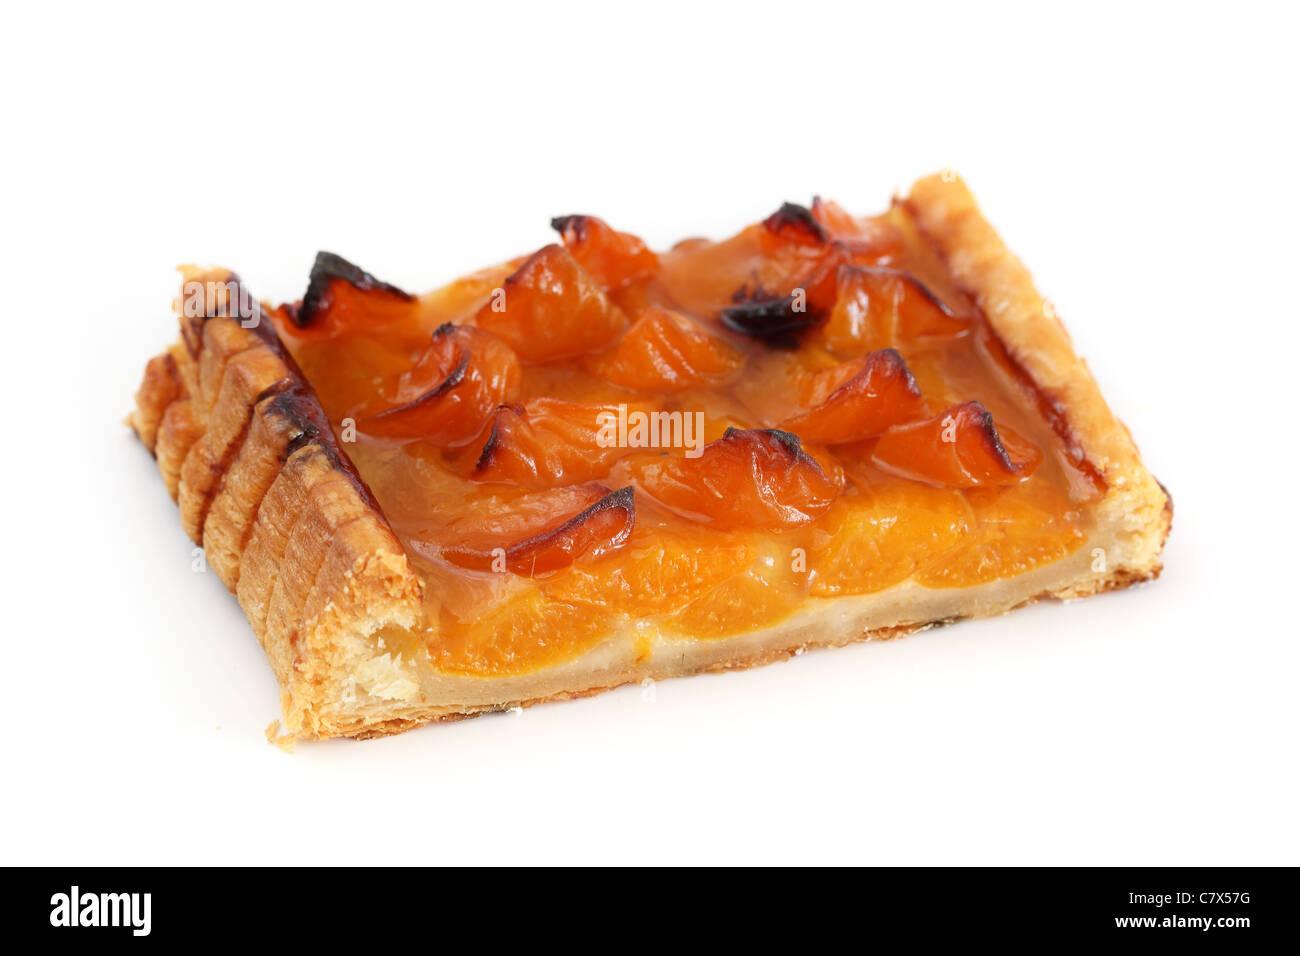 Bande abricots band apricots - Stock Image